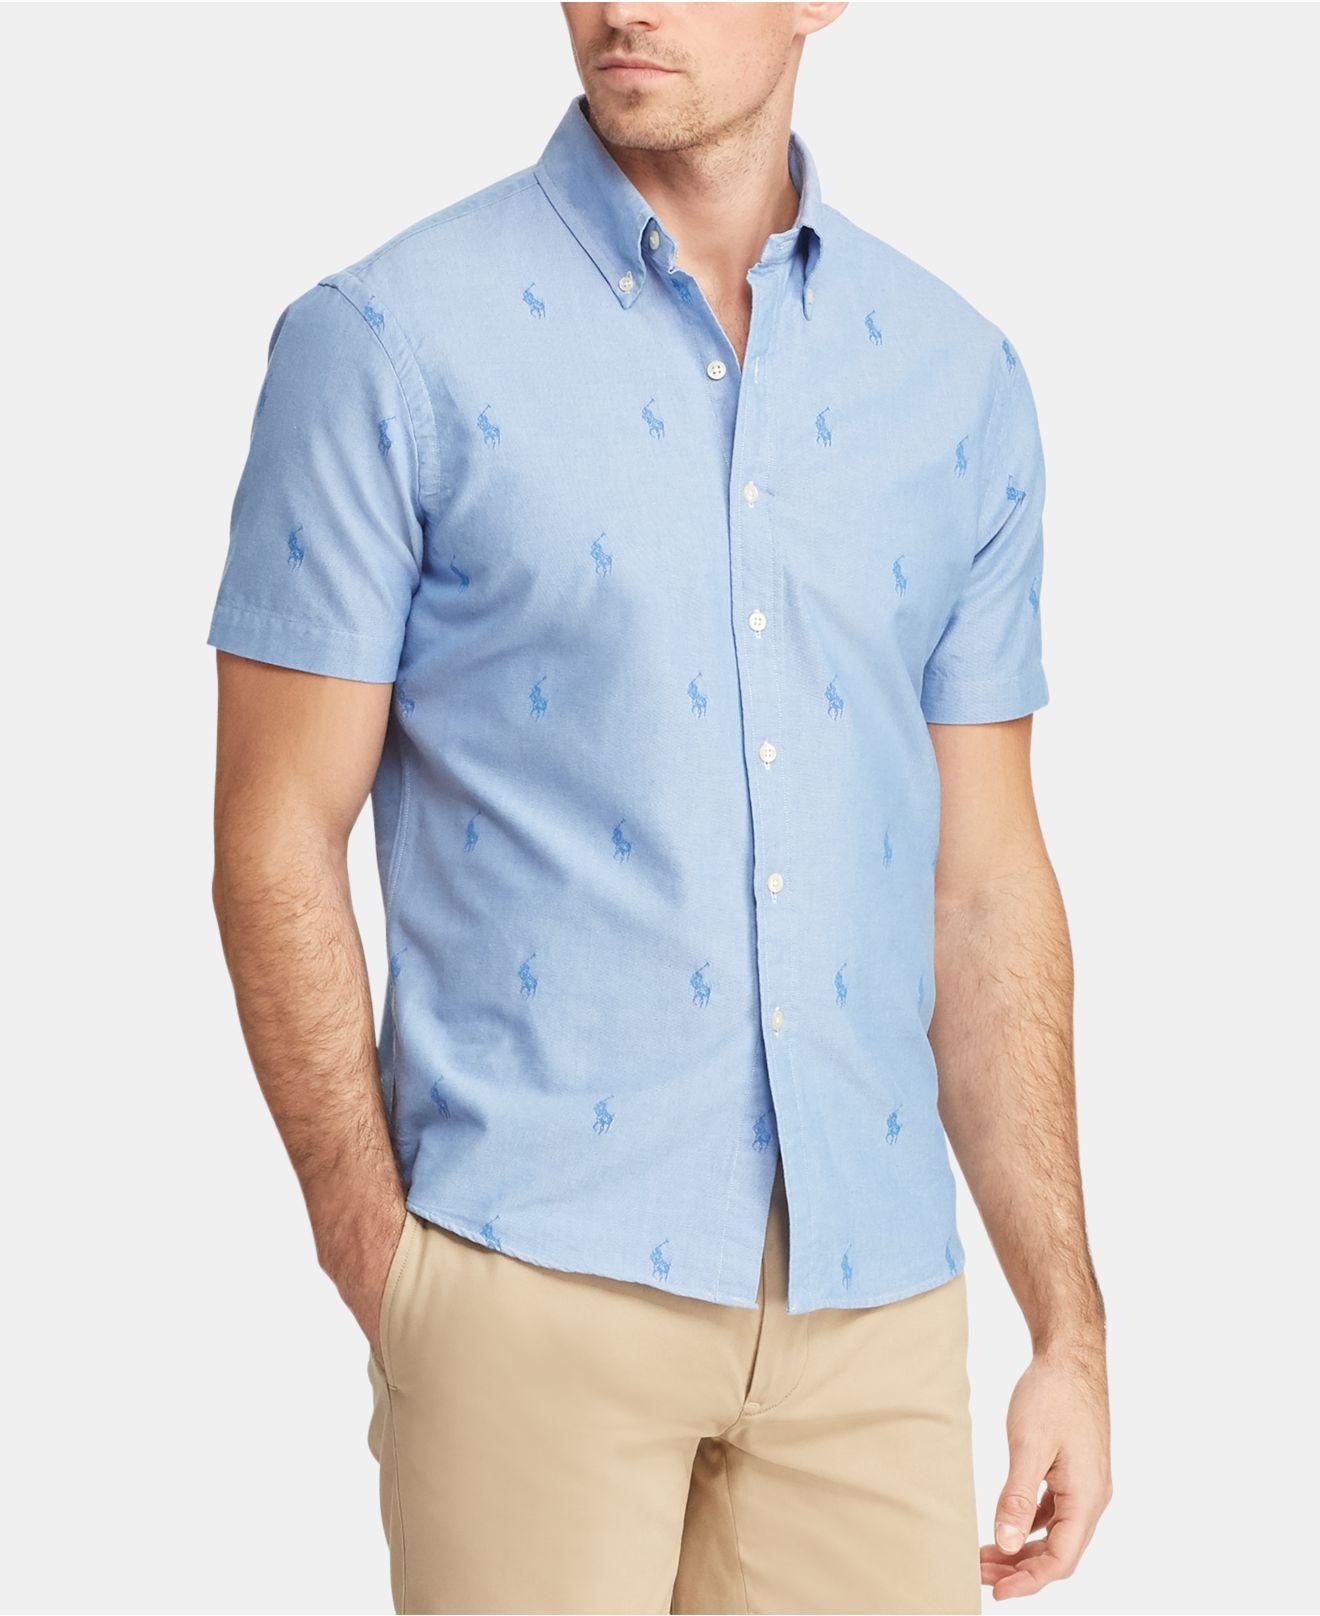 8500dc9c0d127 Lyst - Polo Ralph Lauren Classic-fit Pony Shirt in Blue for Men